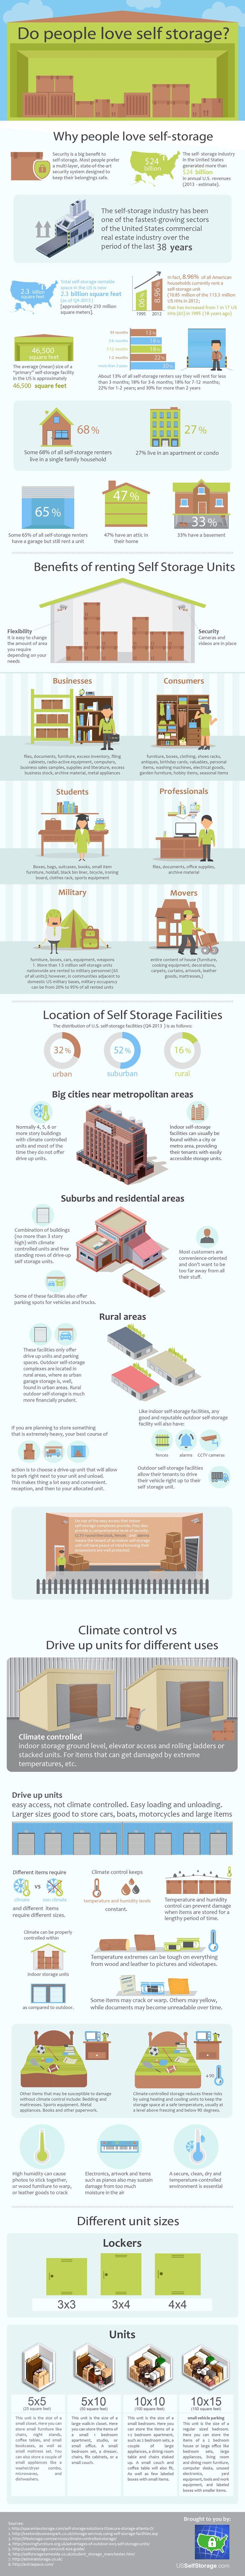 Do People Love Self Storage? #infographic #Storage #SelfStorage #Business